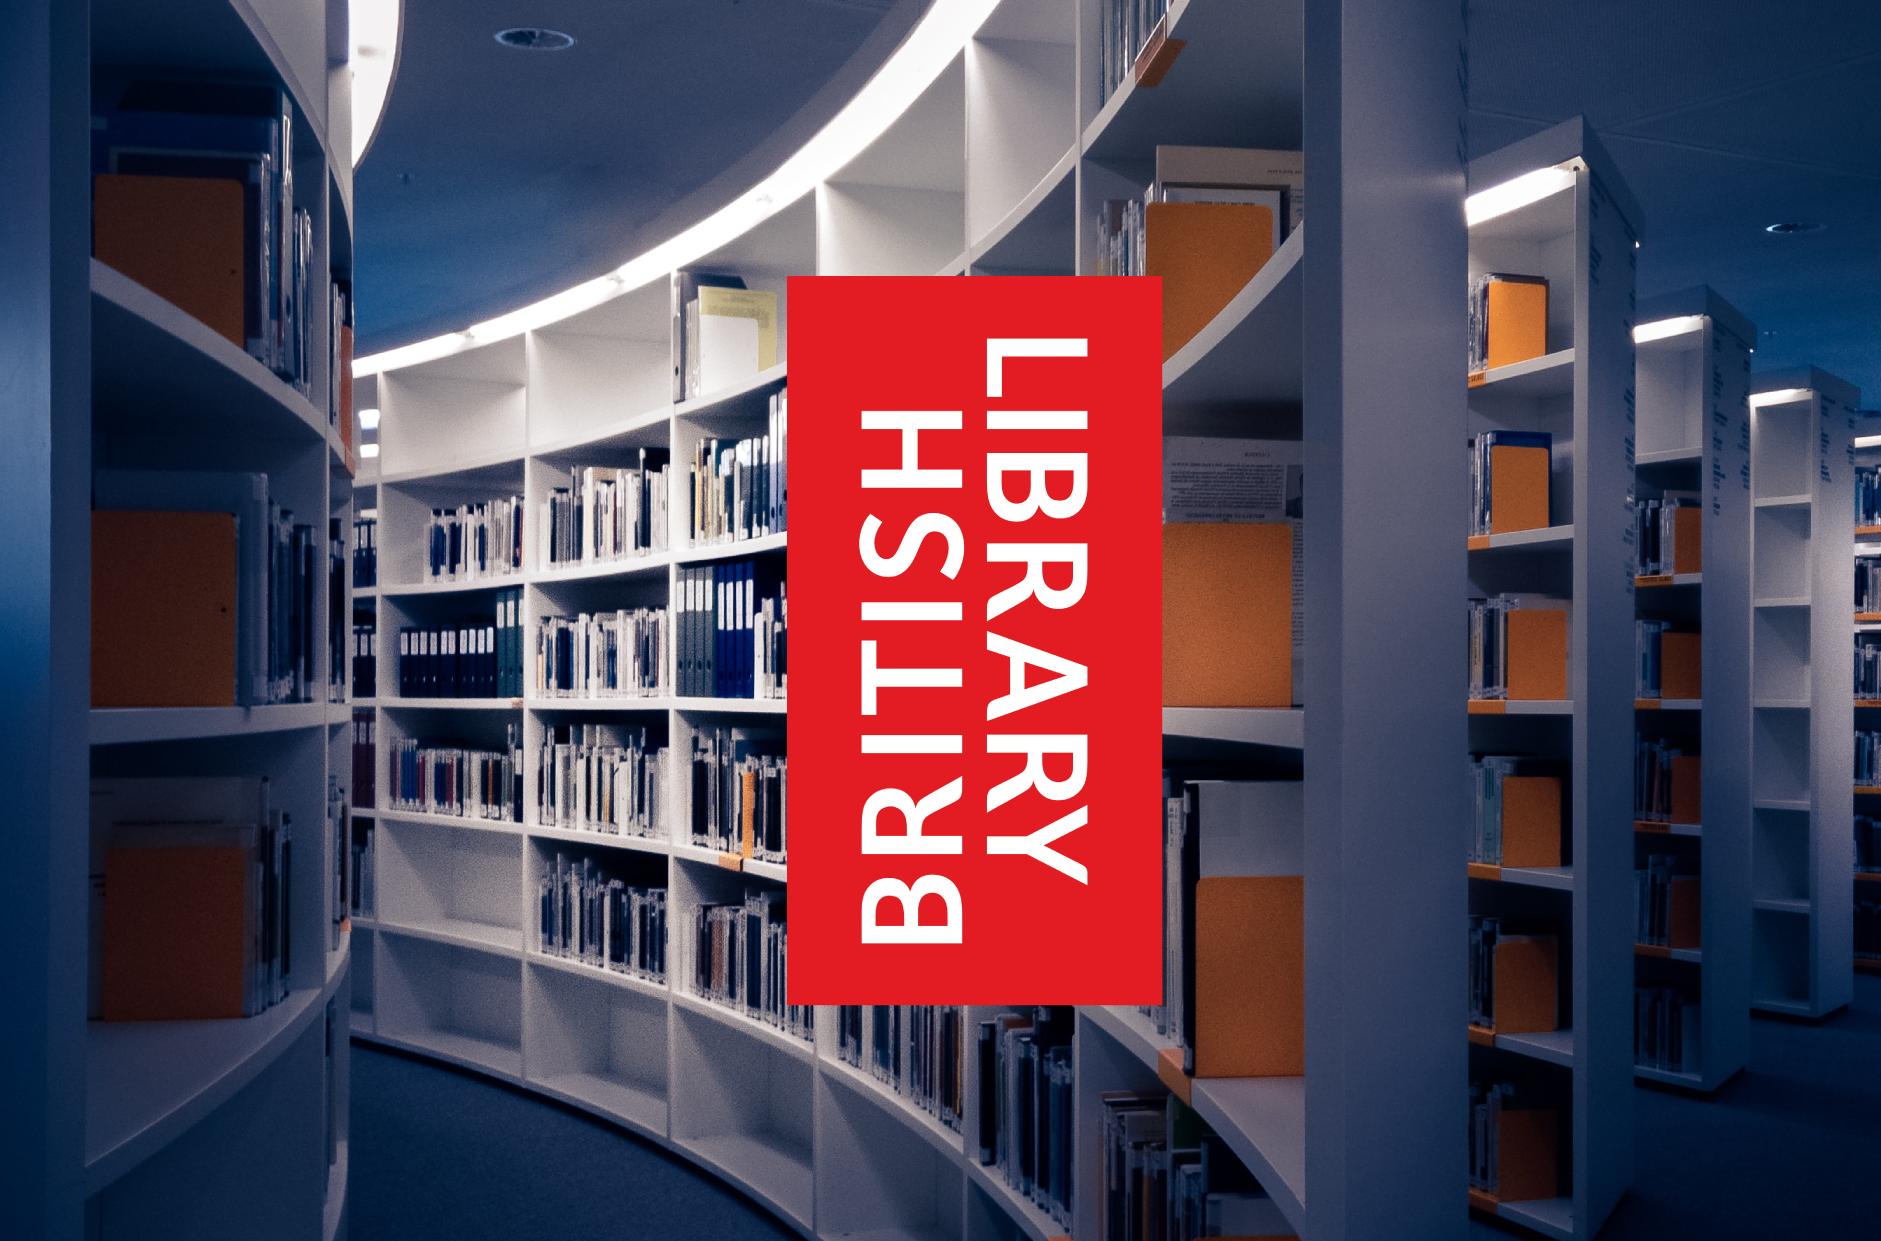 british-librarySFW